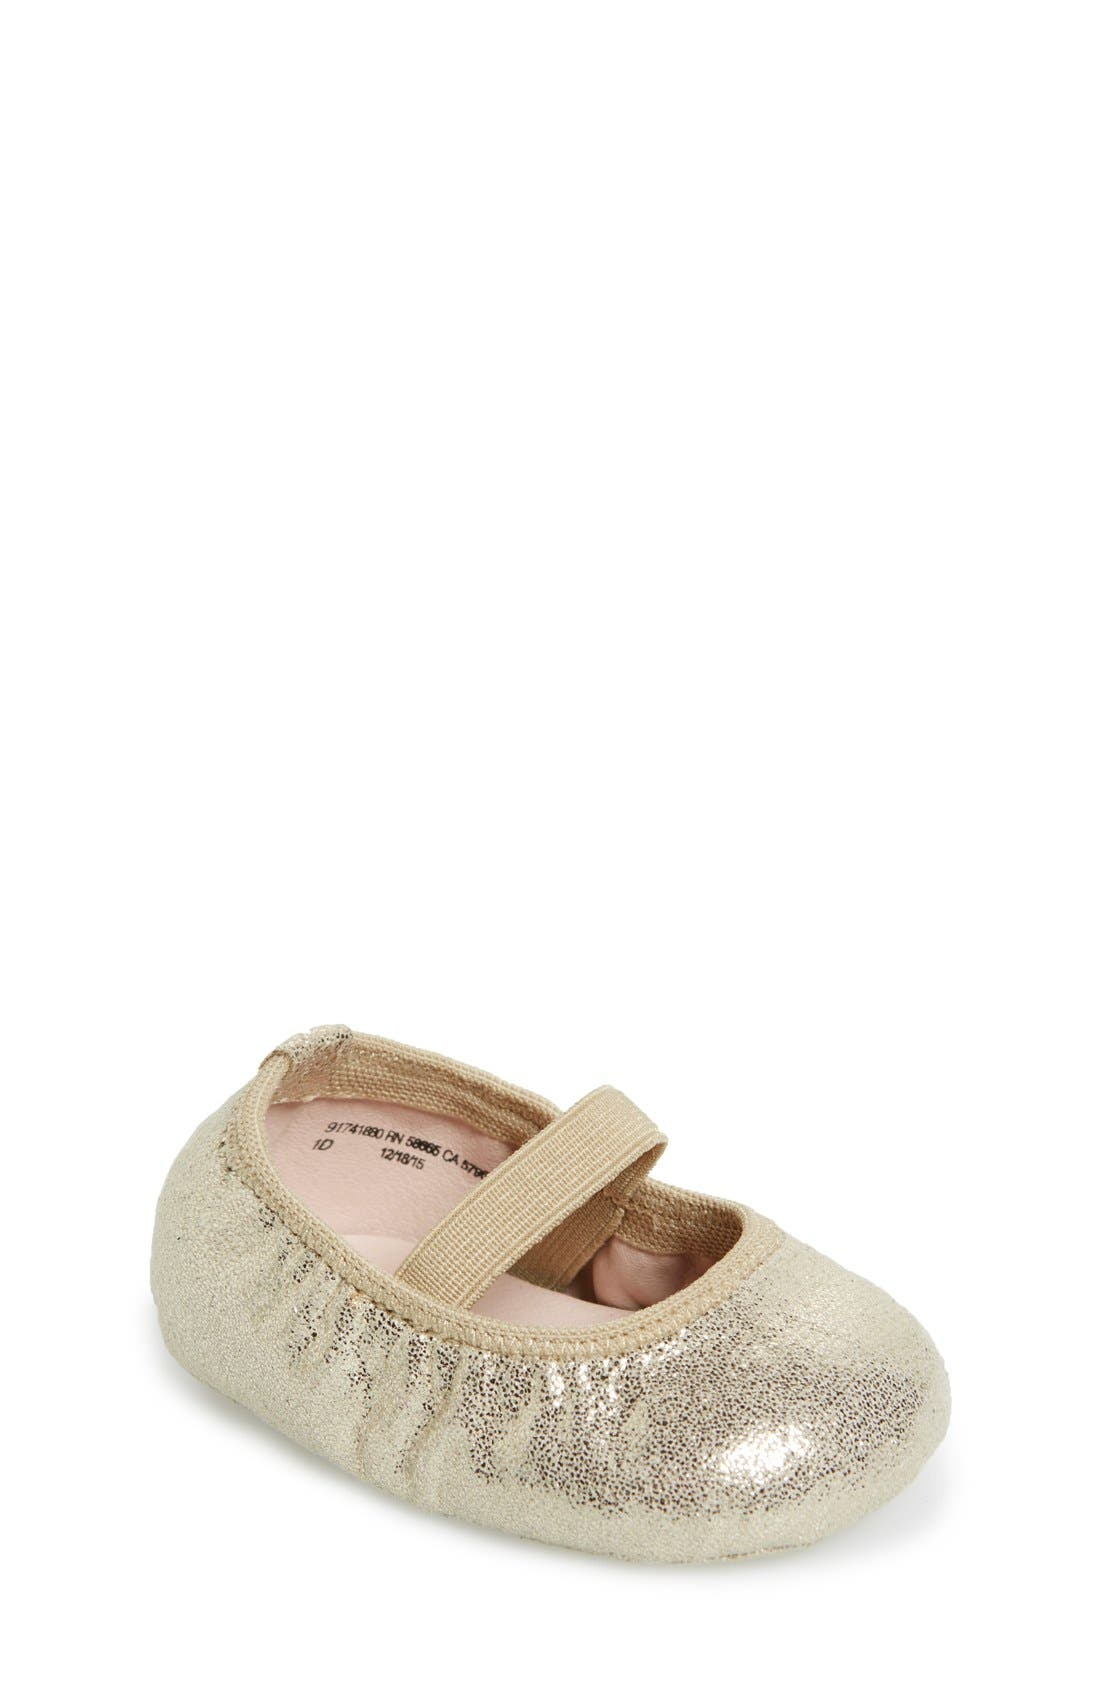 Ruby & Bloom 'Josie' Crib Shoe (Baby)